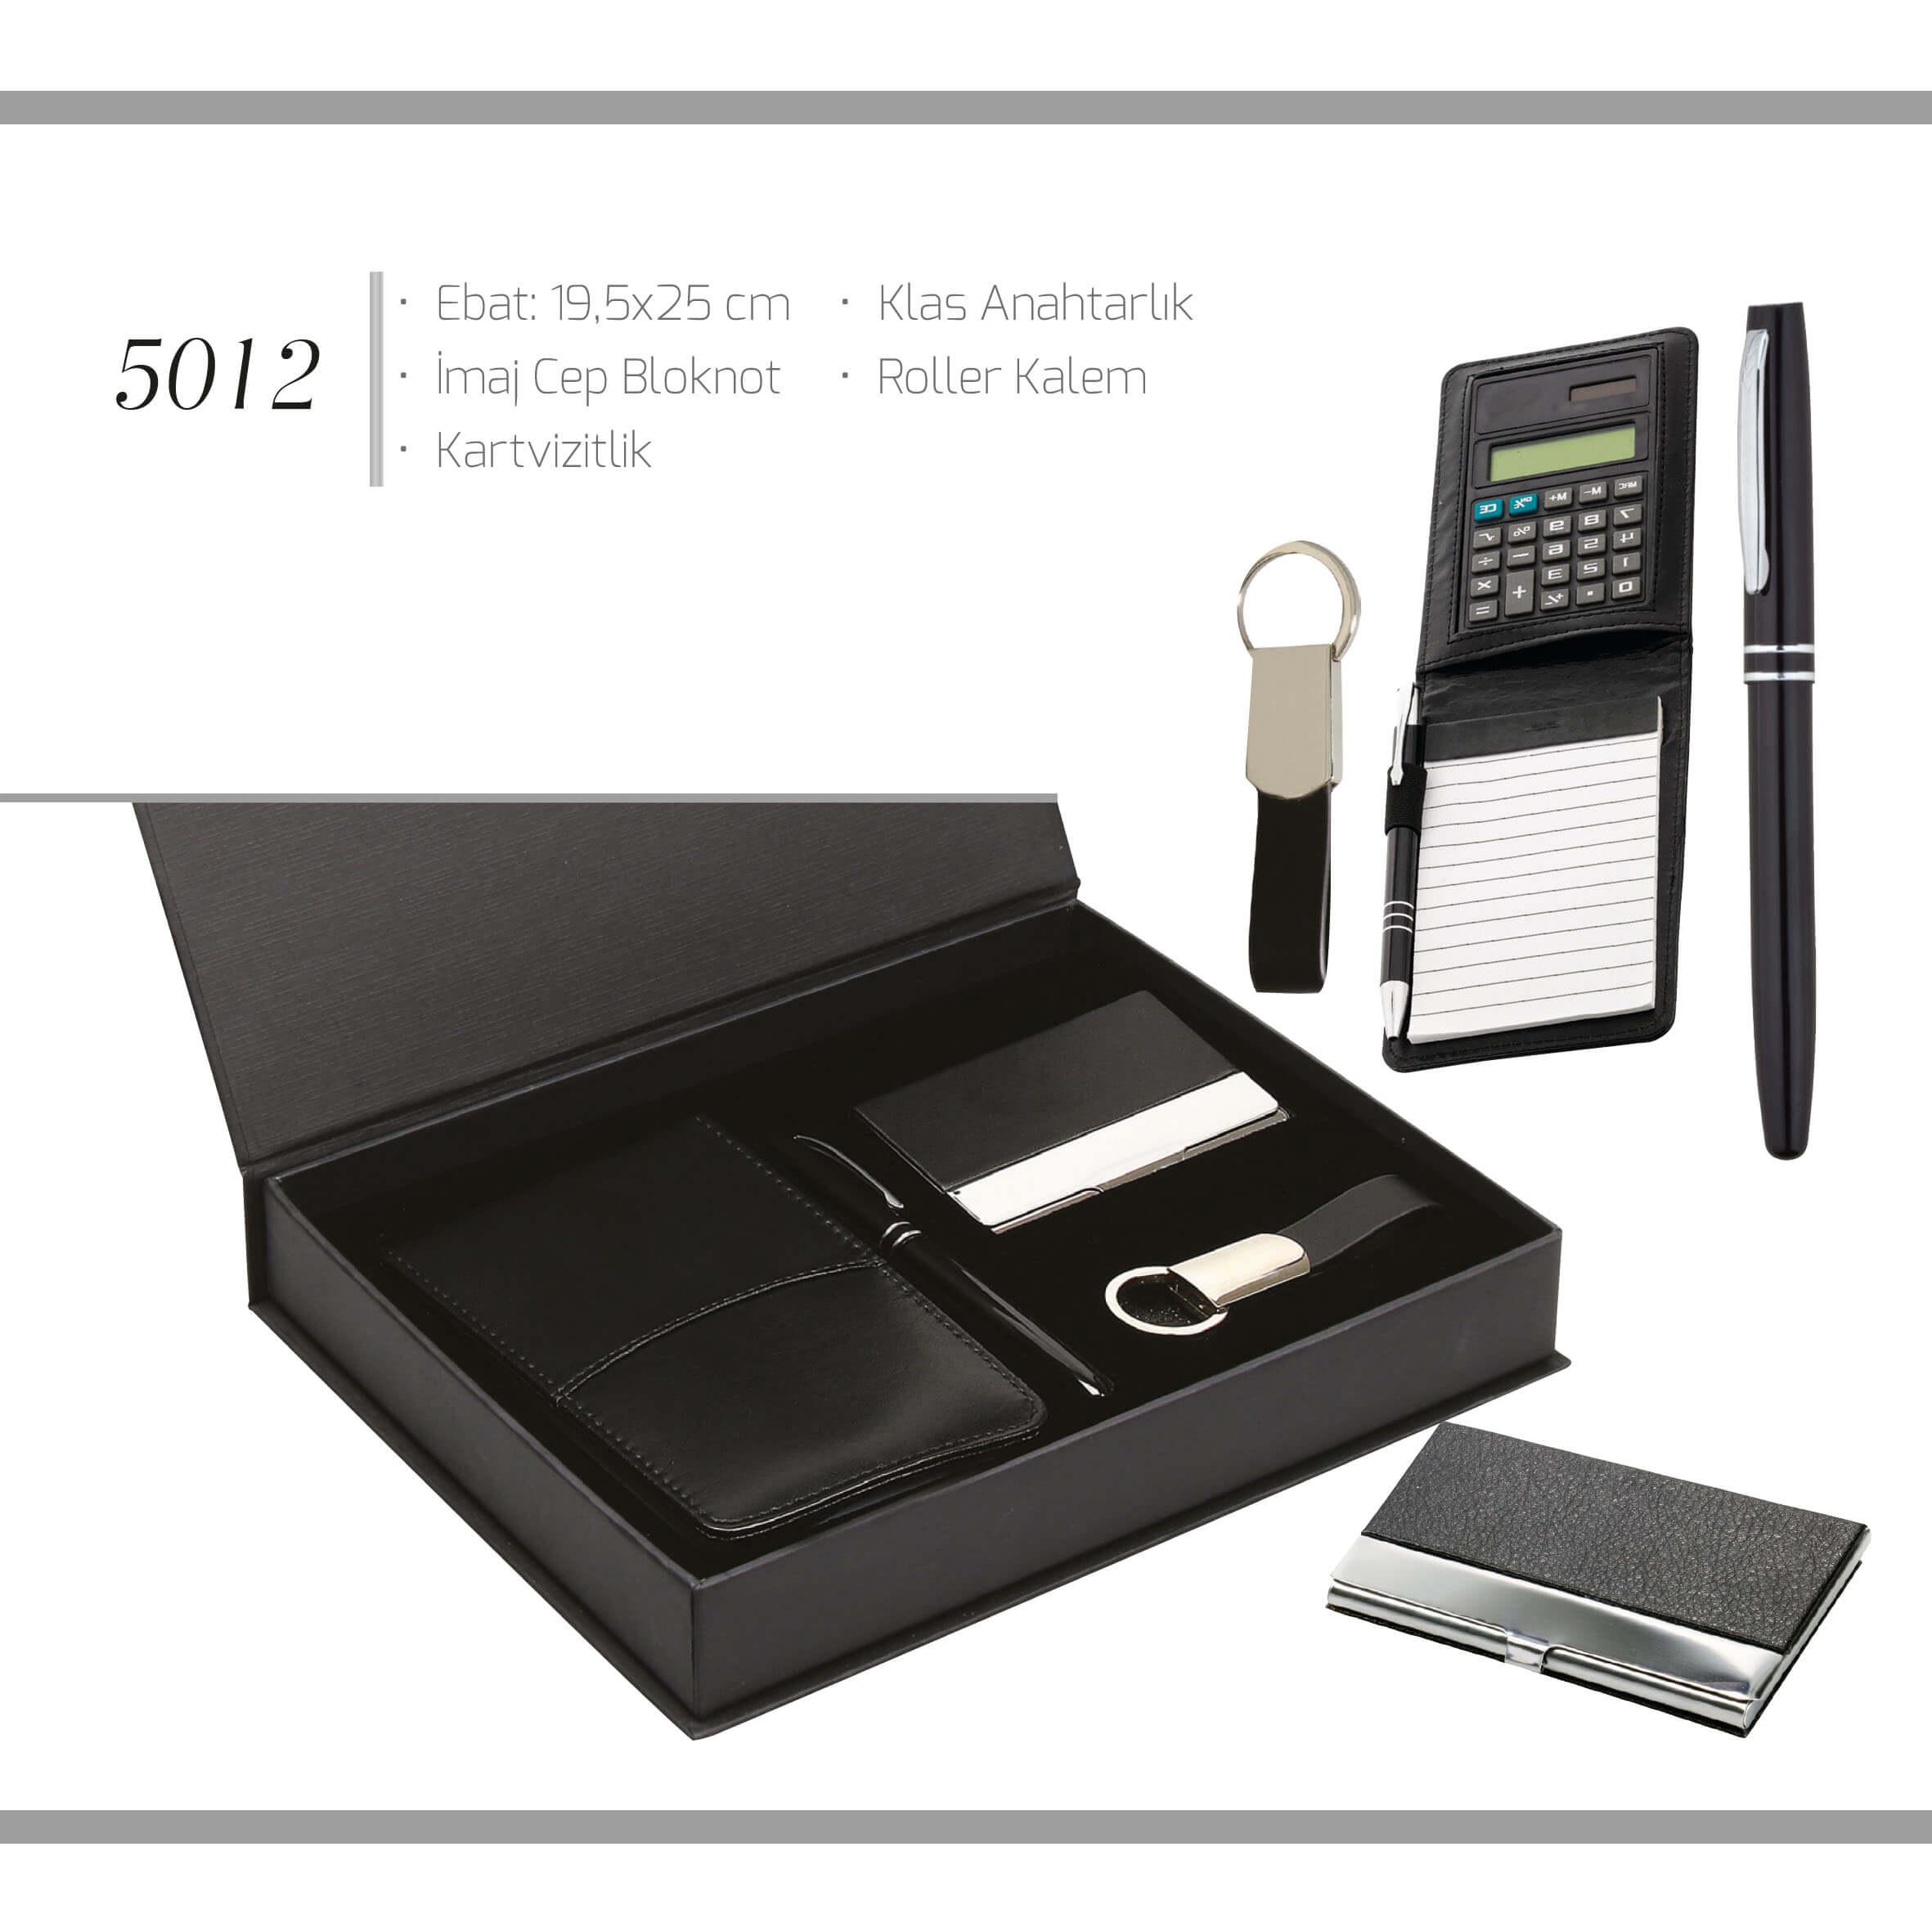 promosyon-promosyon ürünleri-VIP setler-promosyon 5012